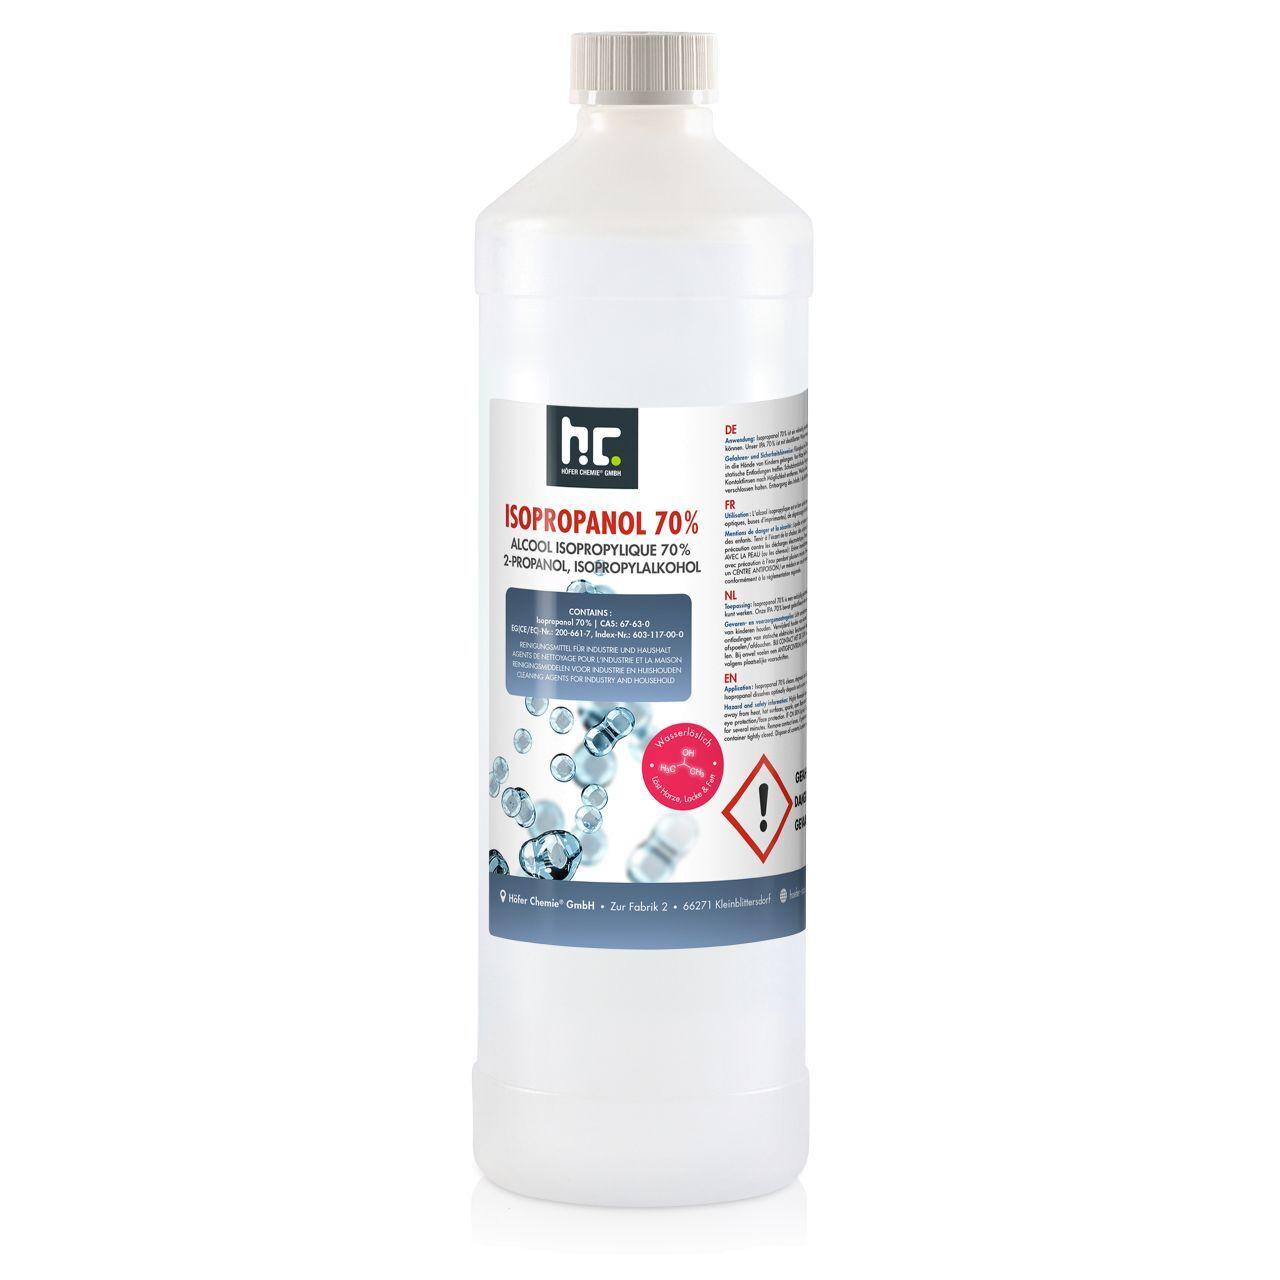 Höfer Chemie 6 l alcool isopropylique 70% (6 x 1 l)